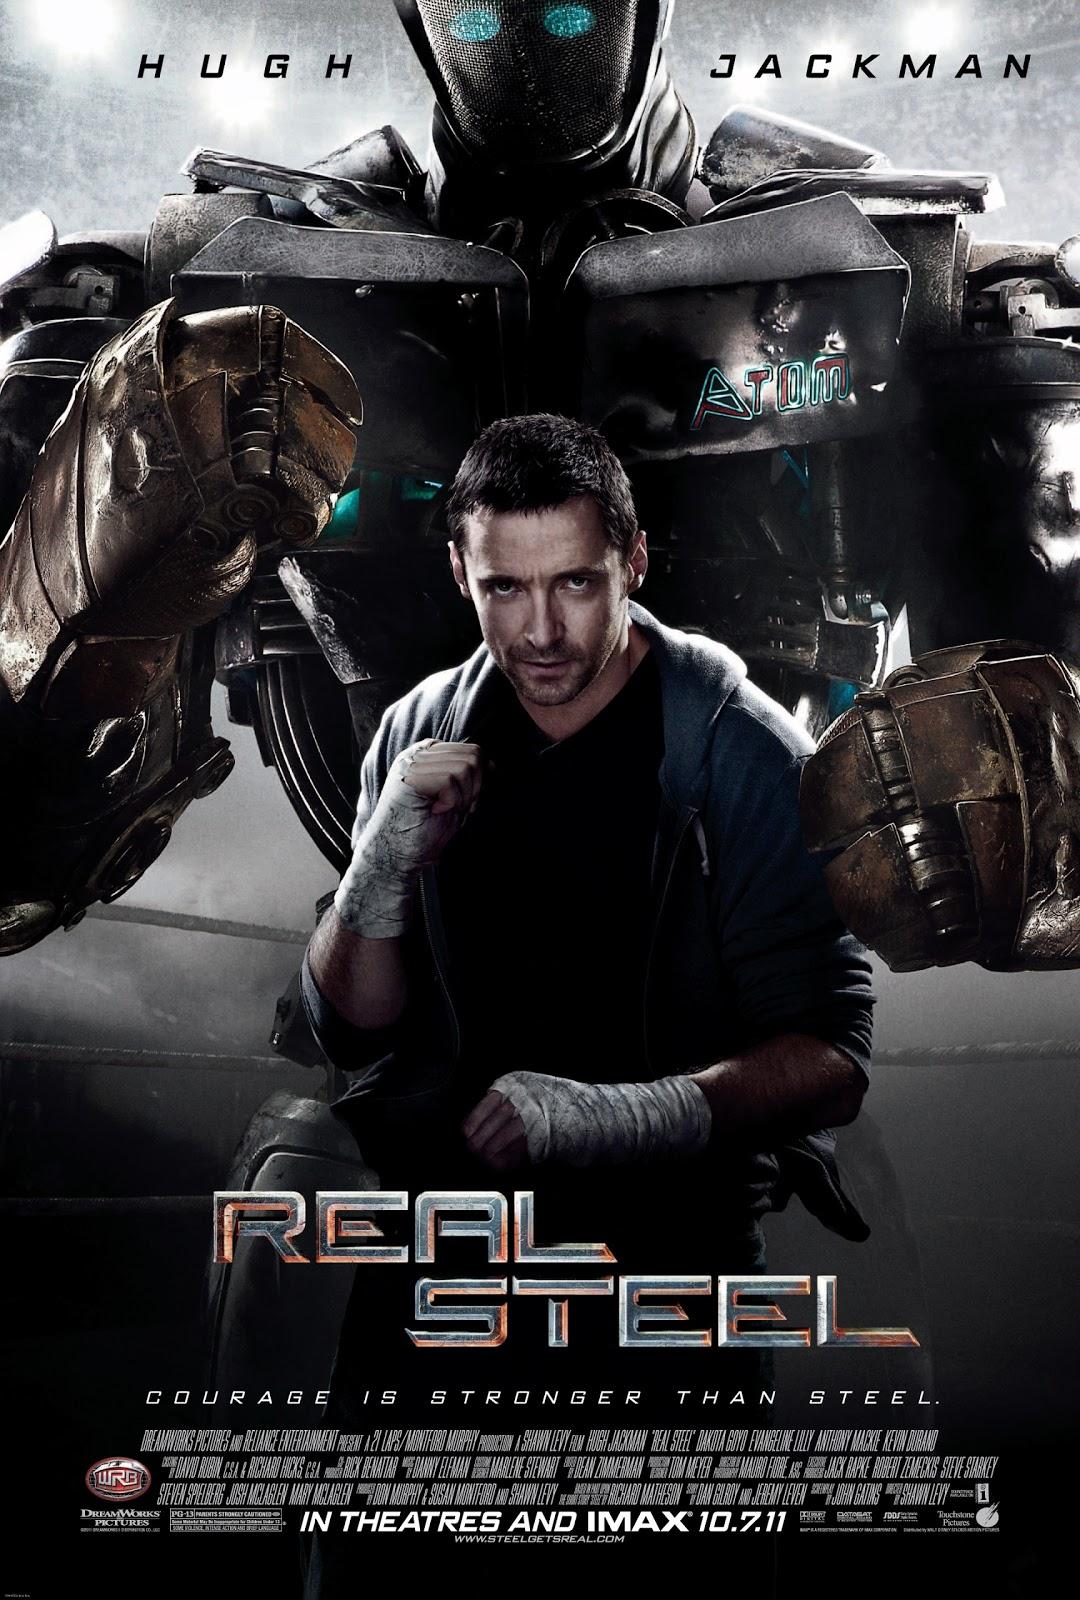 http://4.bp.blogspot.com/-_Gc9HGgXEw0/T_yUbfbldoI/AAAAAAAABX0/1GzUe3iCpTo/s1600/Real-Steel-Movie-Poster-Hugh-Jackman.jpg